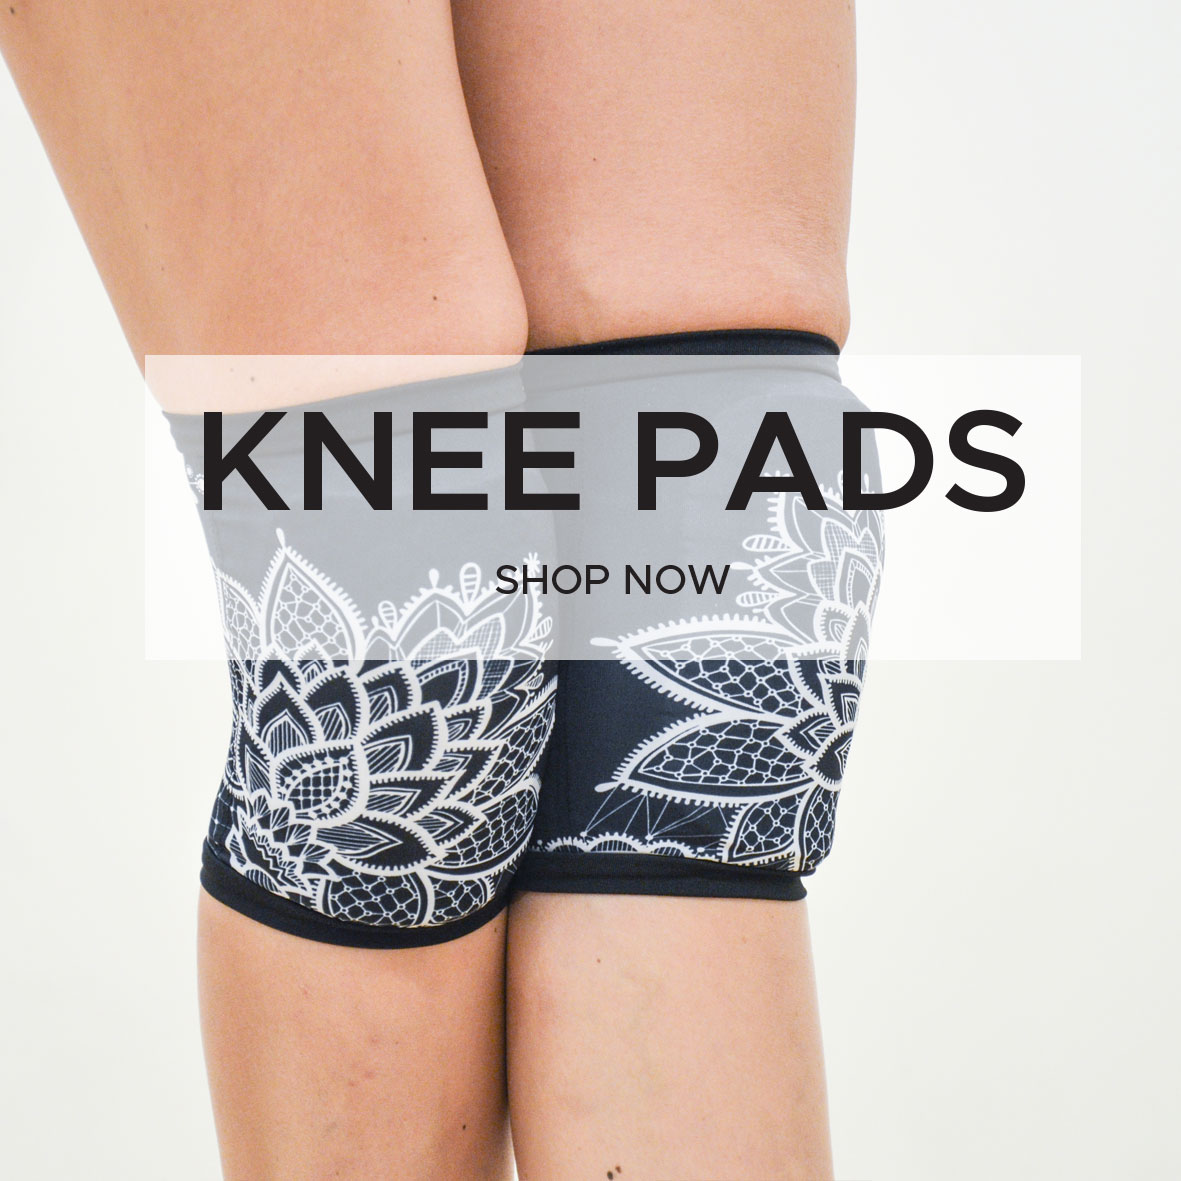 boomkats pole dance clothes knee pads